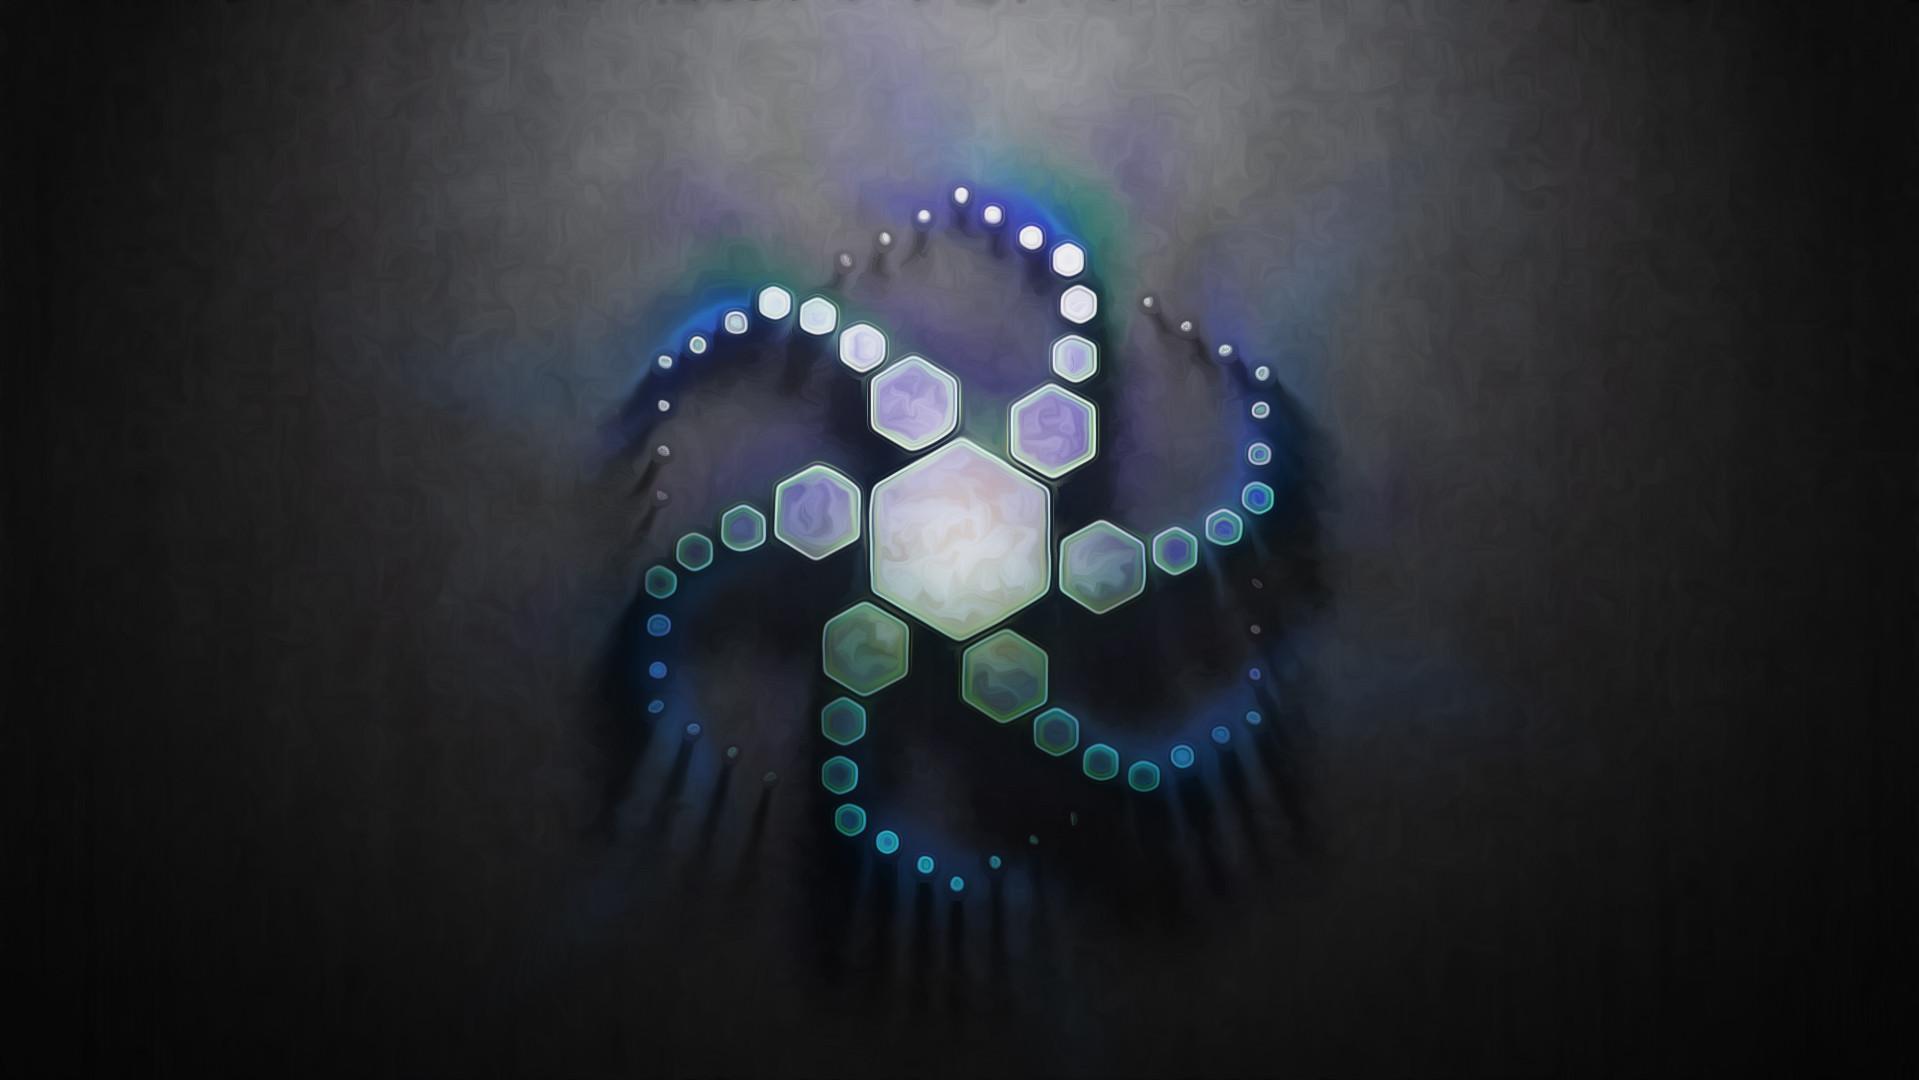 Cephalon-Suda-Blue-×-Warframe-Syndicate-wallpaper-wp5205084